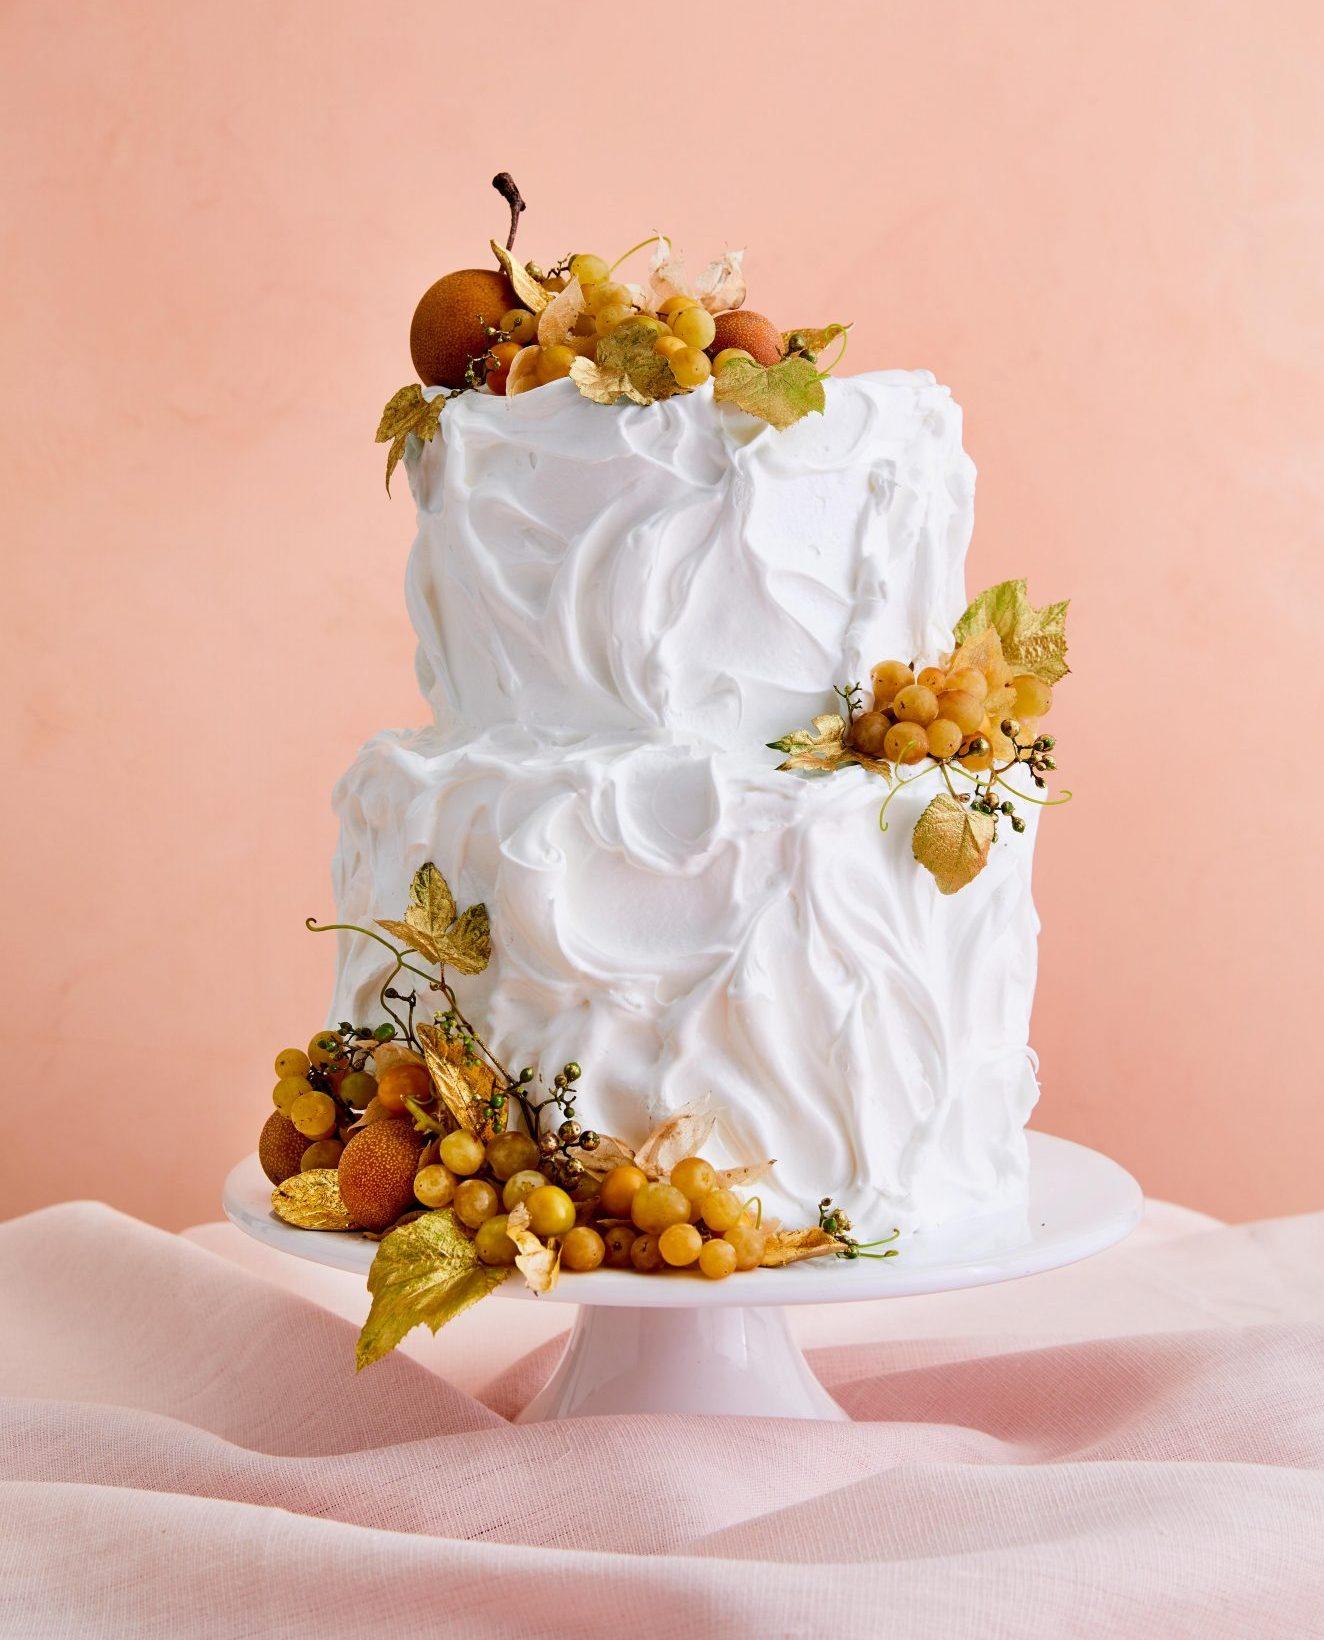 lmond and chocolate-ganache cake